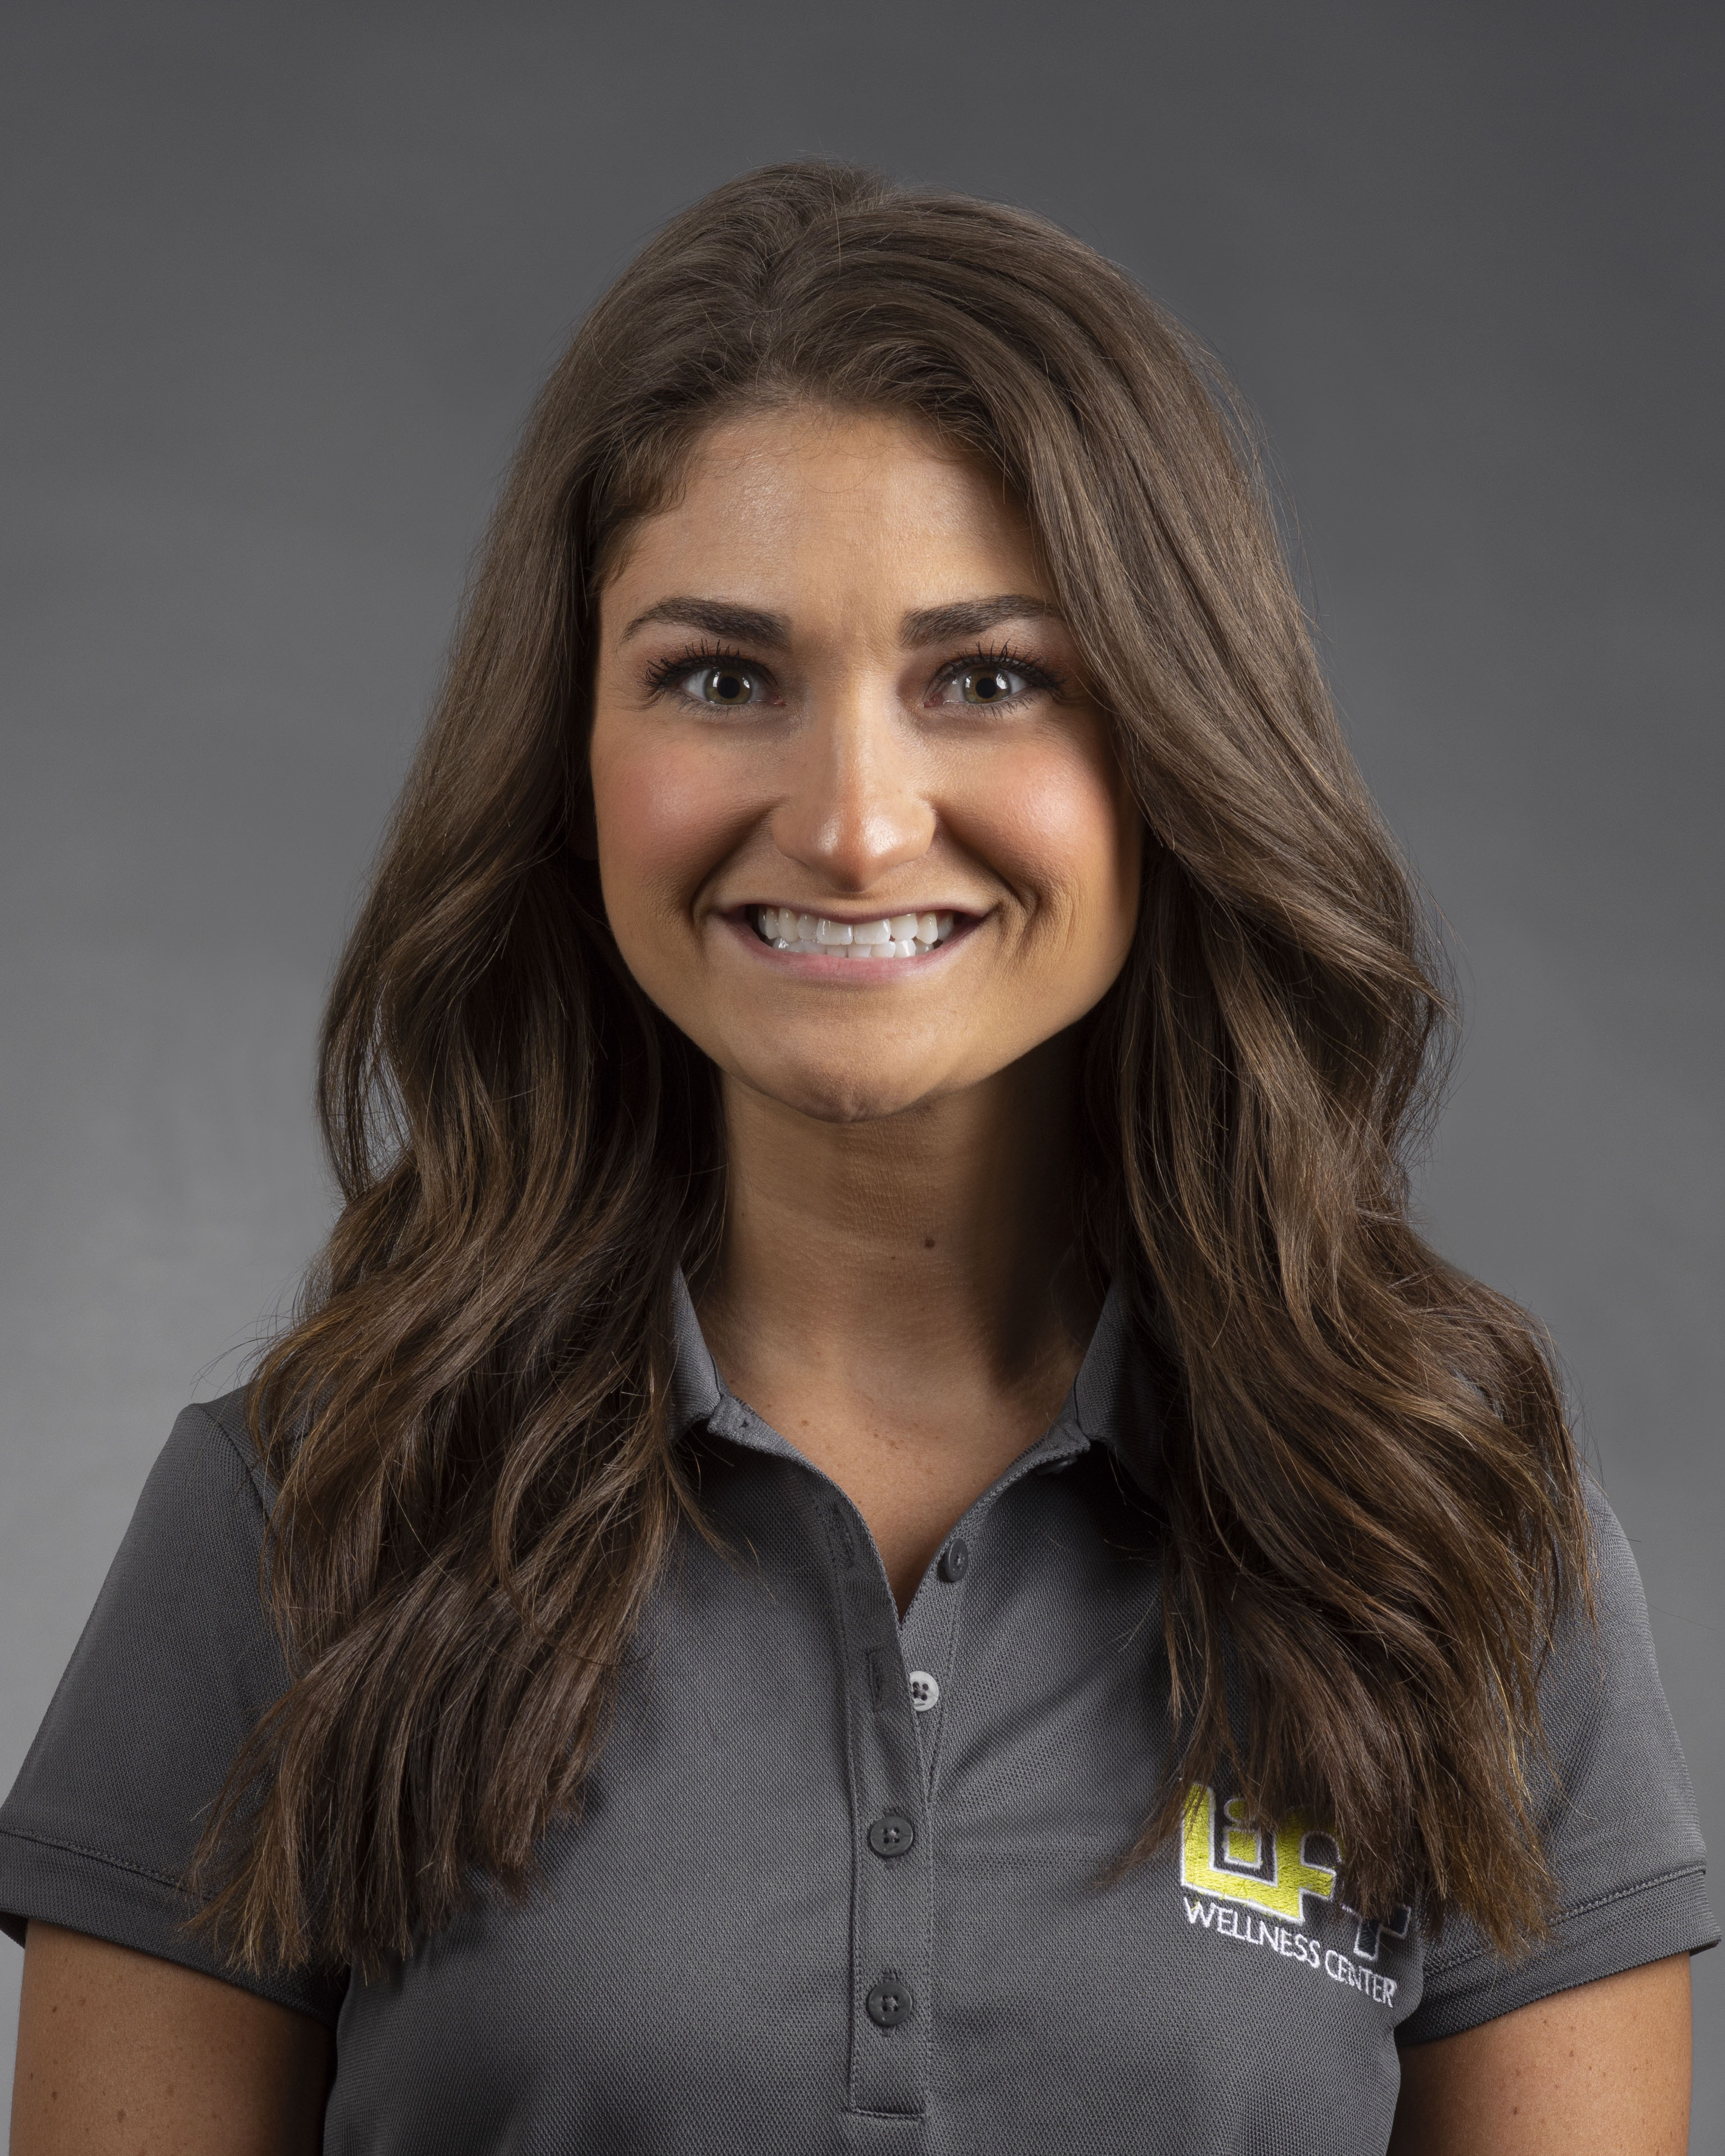 Lillian Forester | Fitness Tech